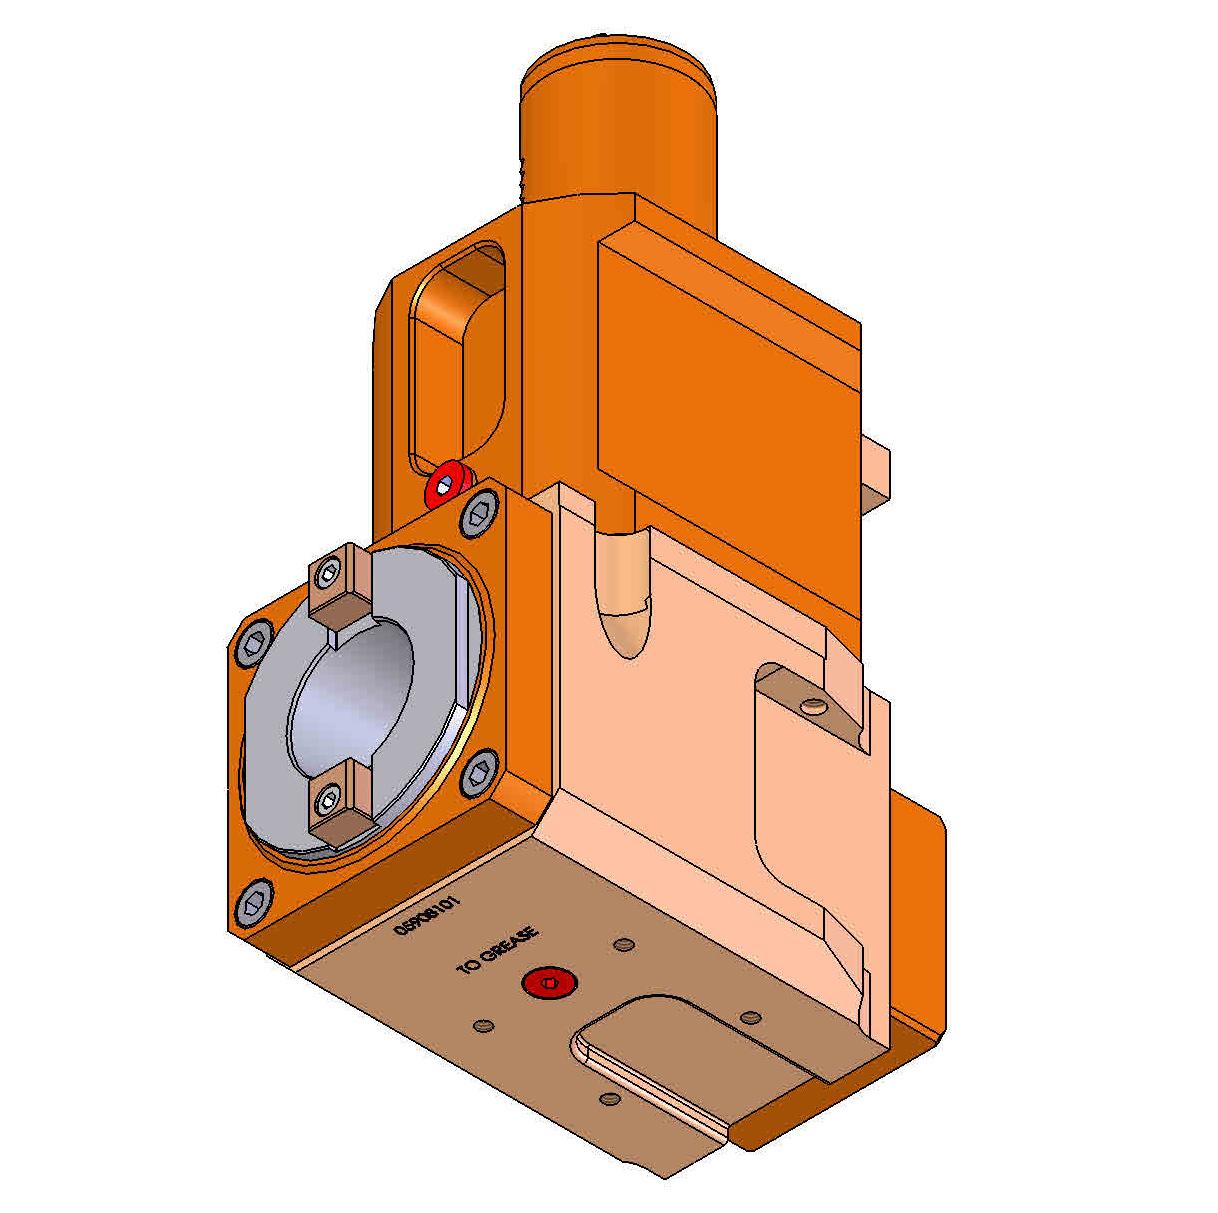 LT-A VDI50 ISOBT40LRF2:1H160MZ.